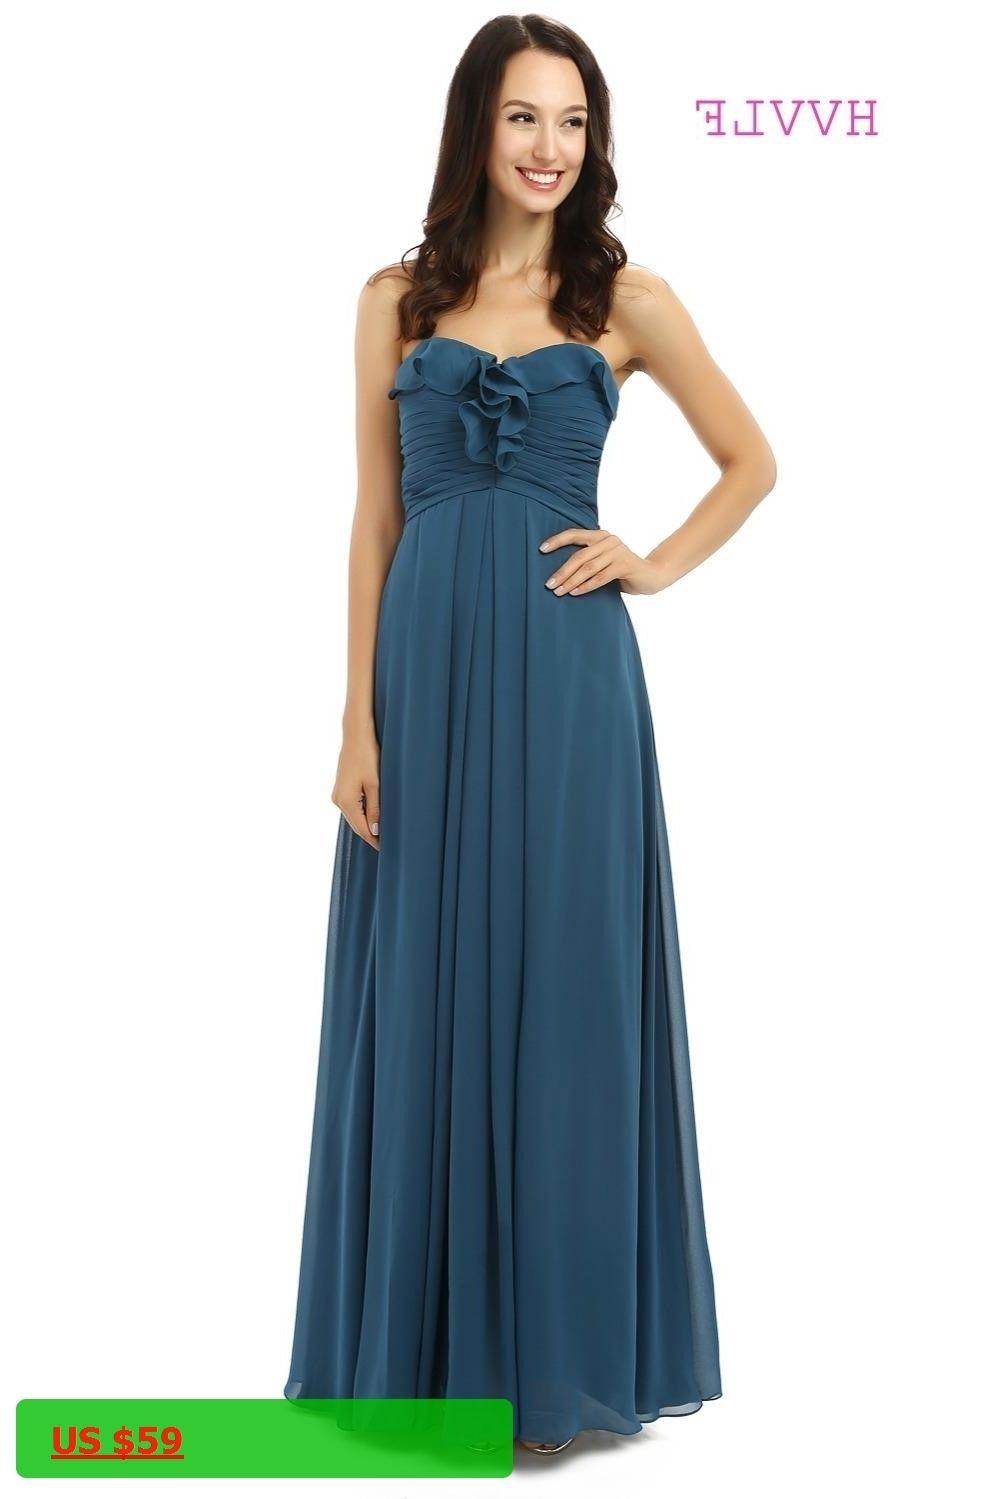 Dark blue 2018 cheap bridesmaid dresses under 50 a line sweetheart dark blue 2018 cheap bridesmaid dresses under 50 a line sweetheart floor length chiffon lace ombrellifo Choice Image